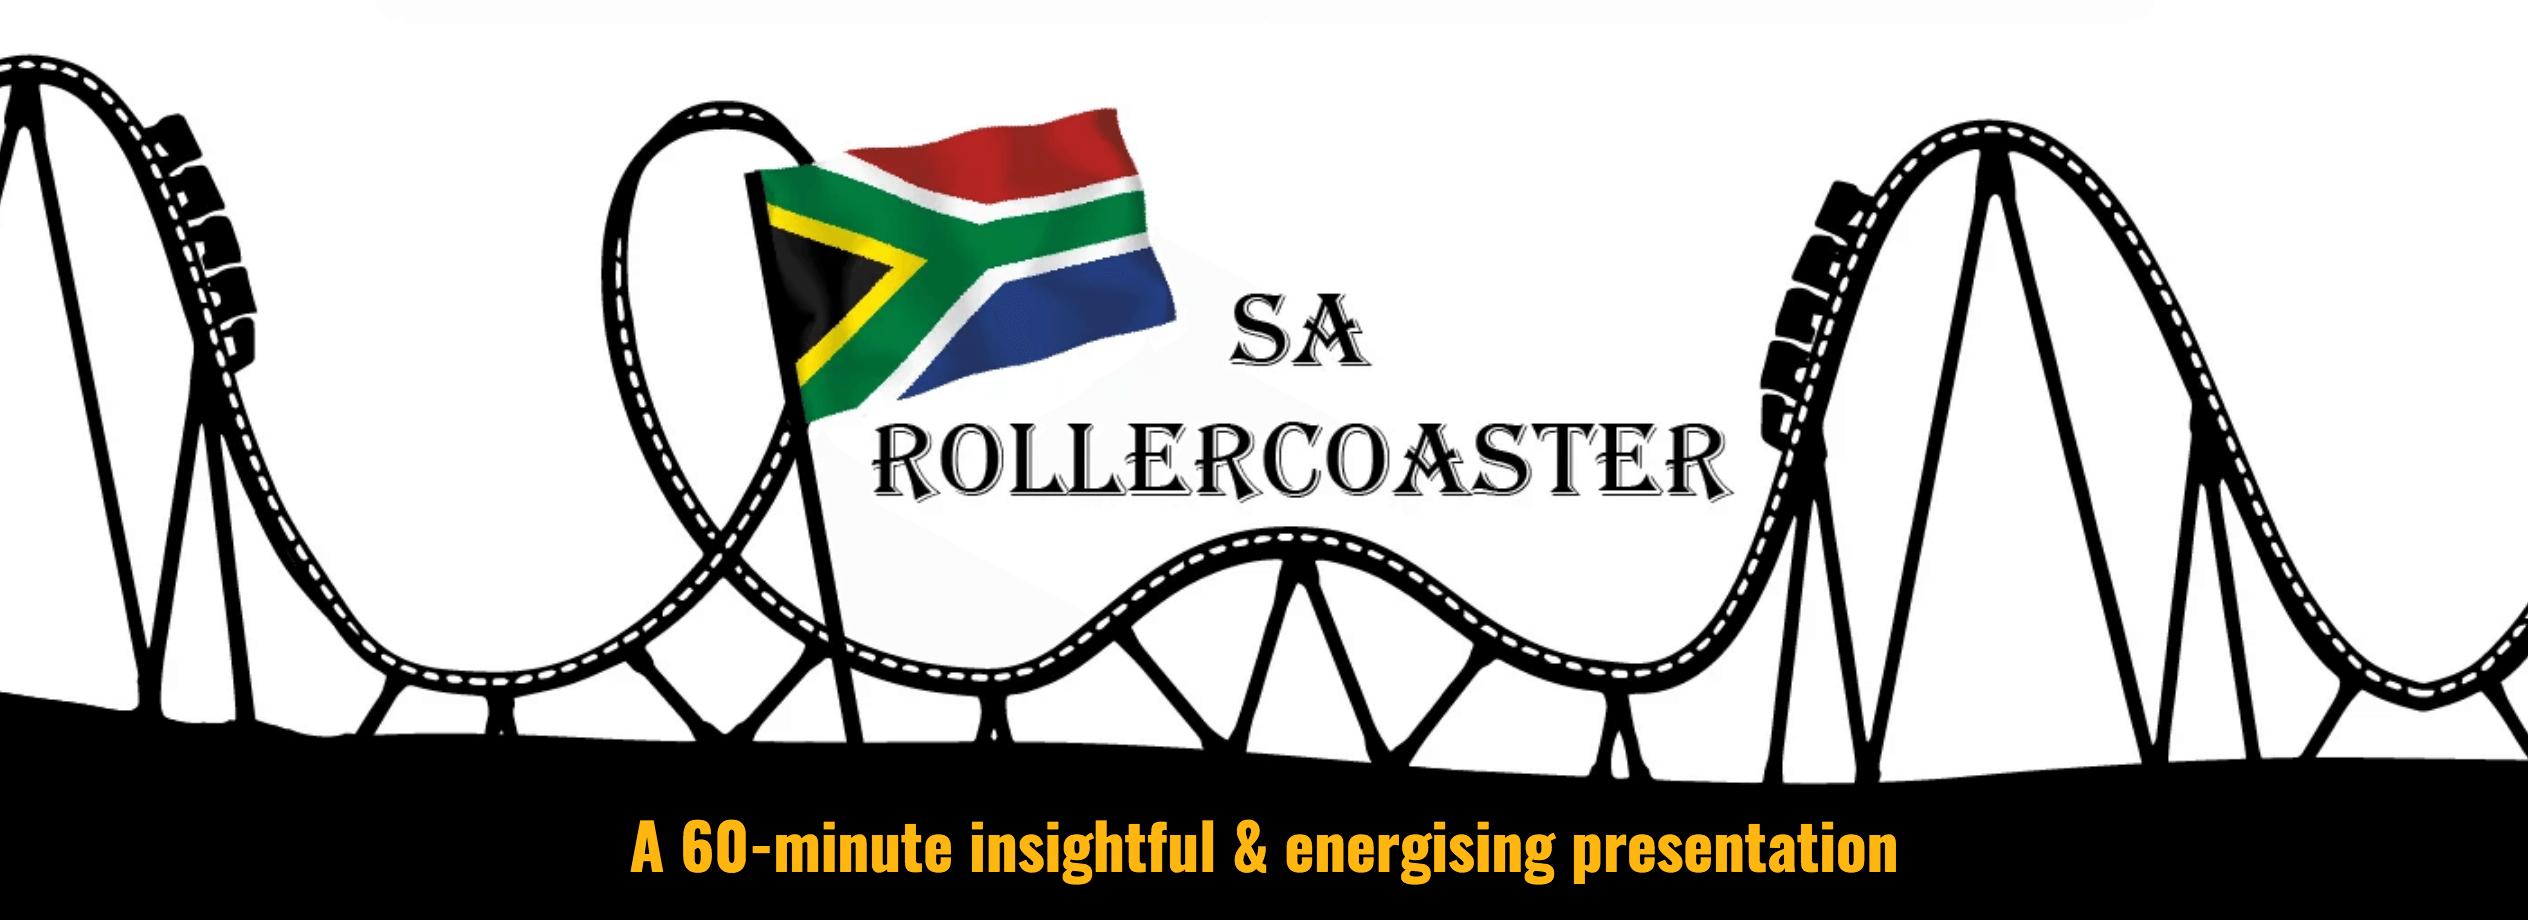 SA Rollercoaster – new presentation